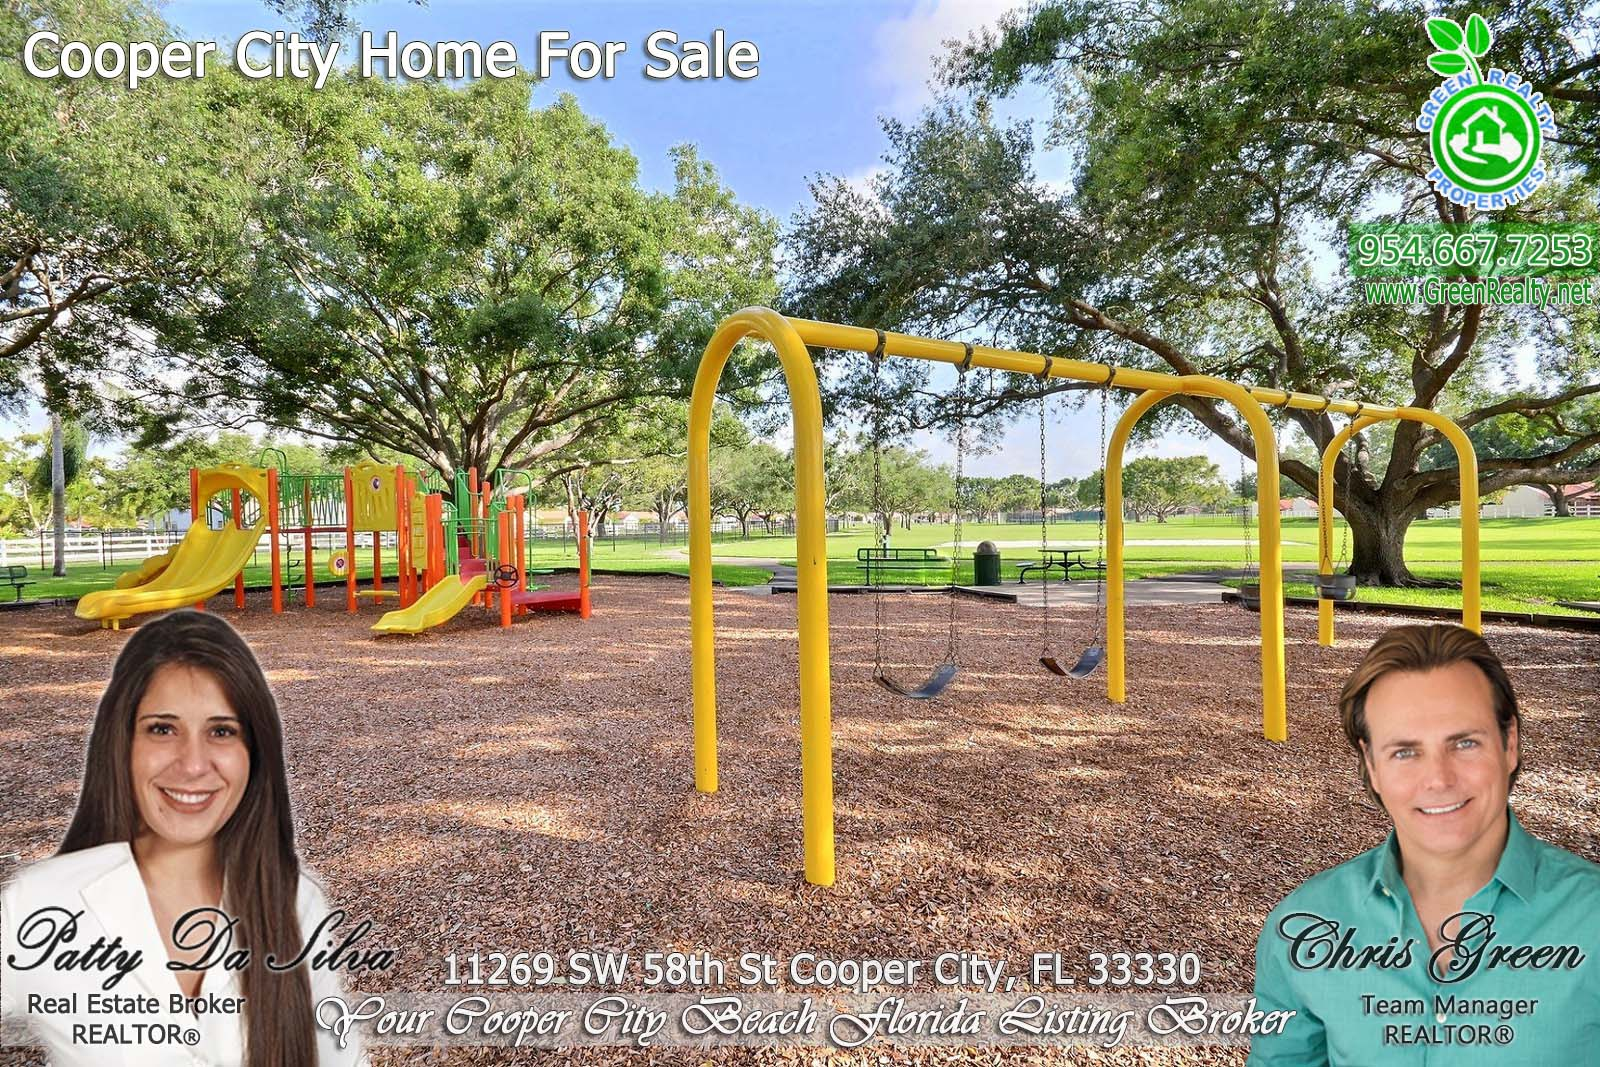 27 Cooper City Real Estate - Villas (7)